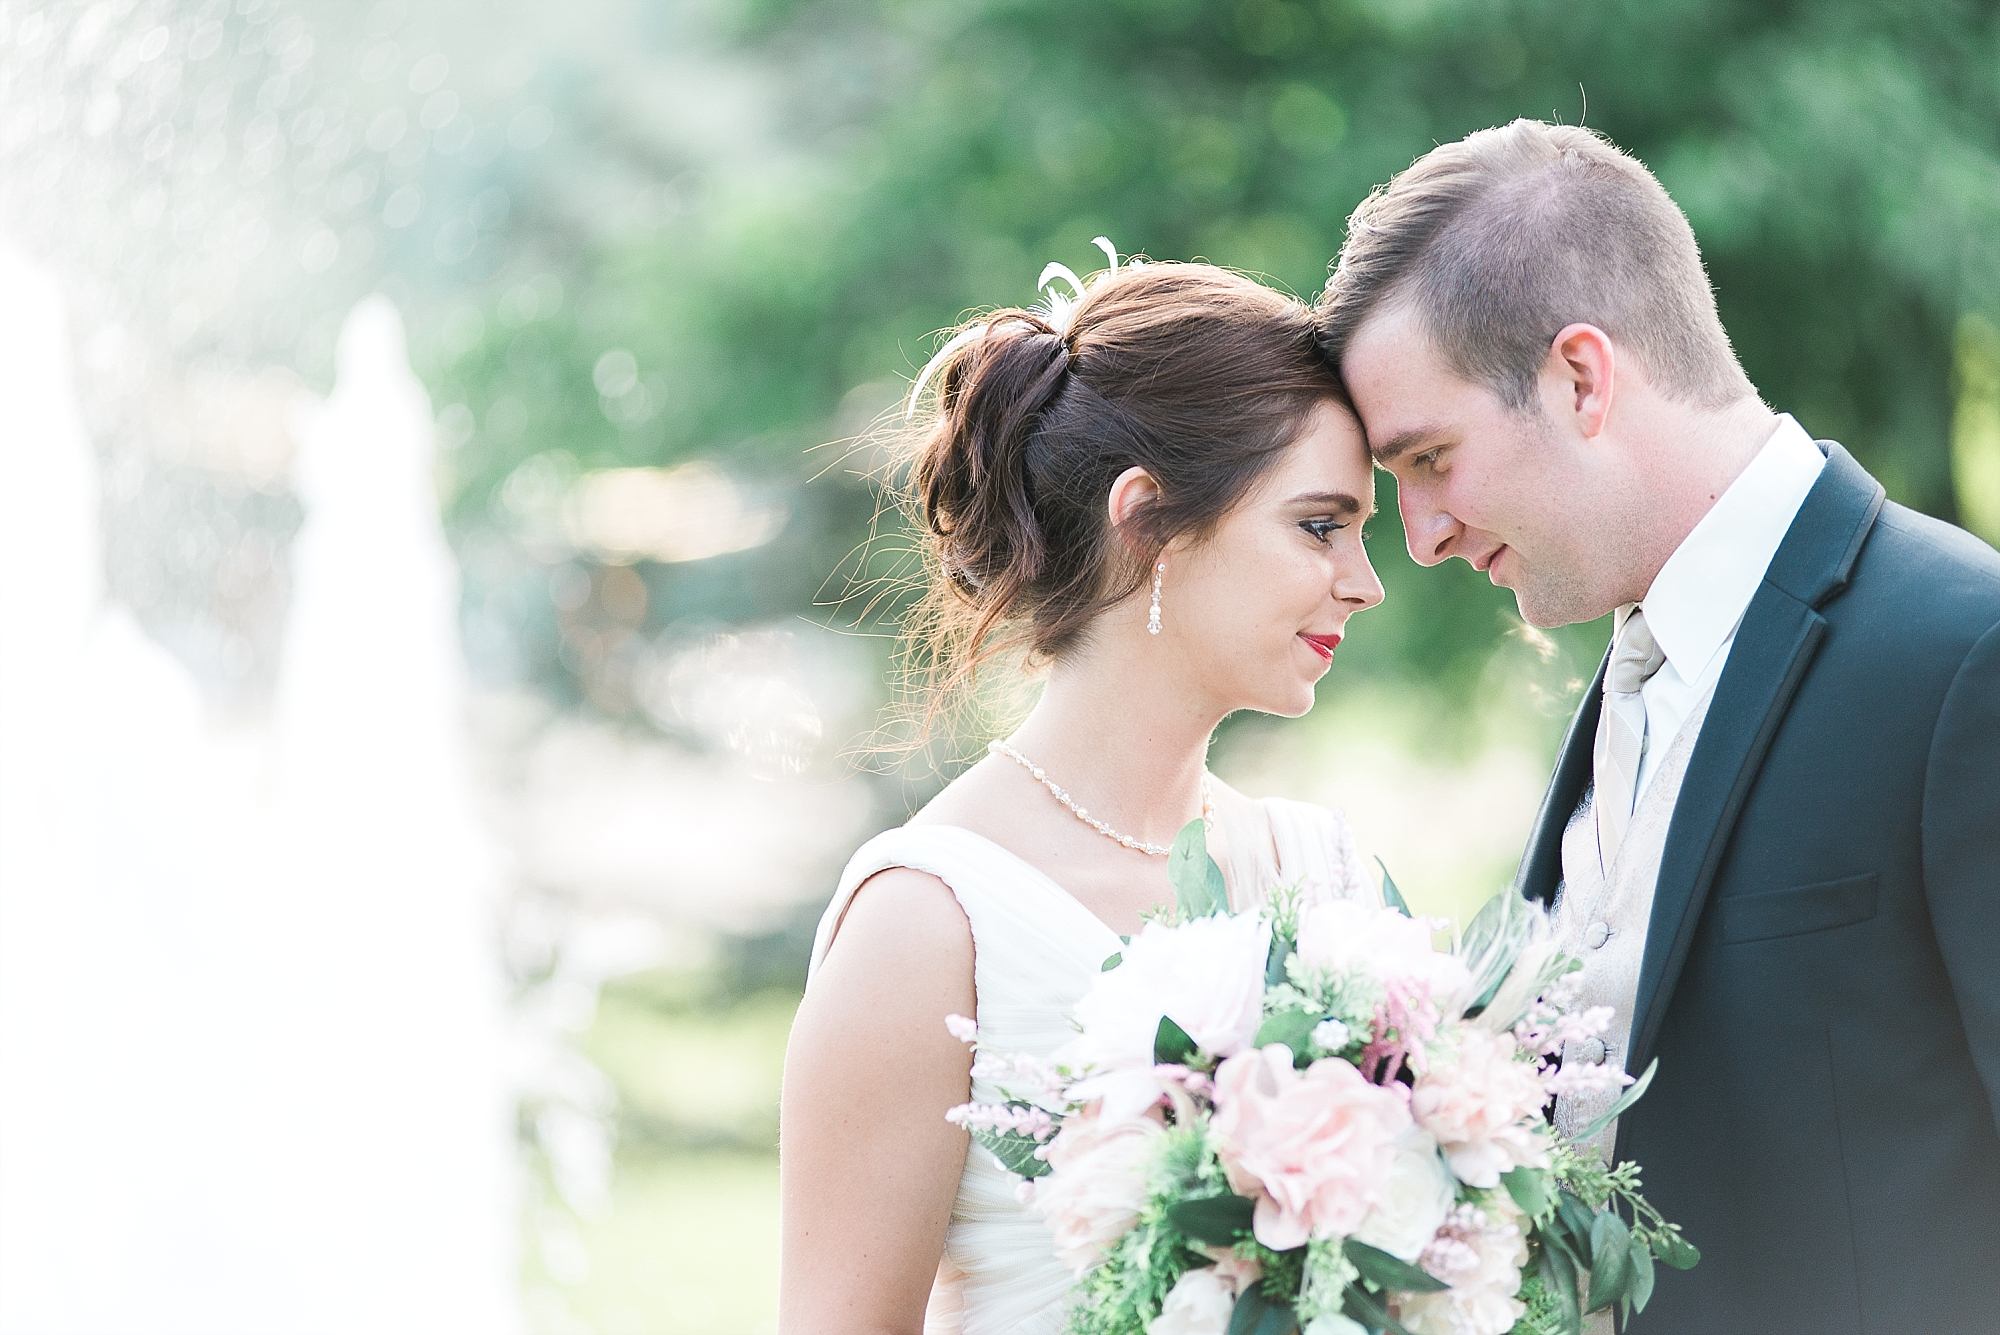 Kentucky wedding photography team